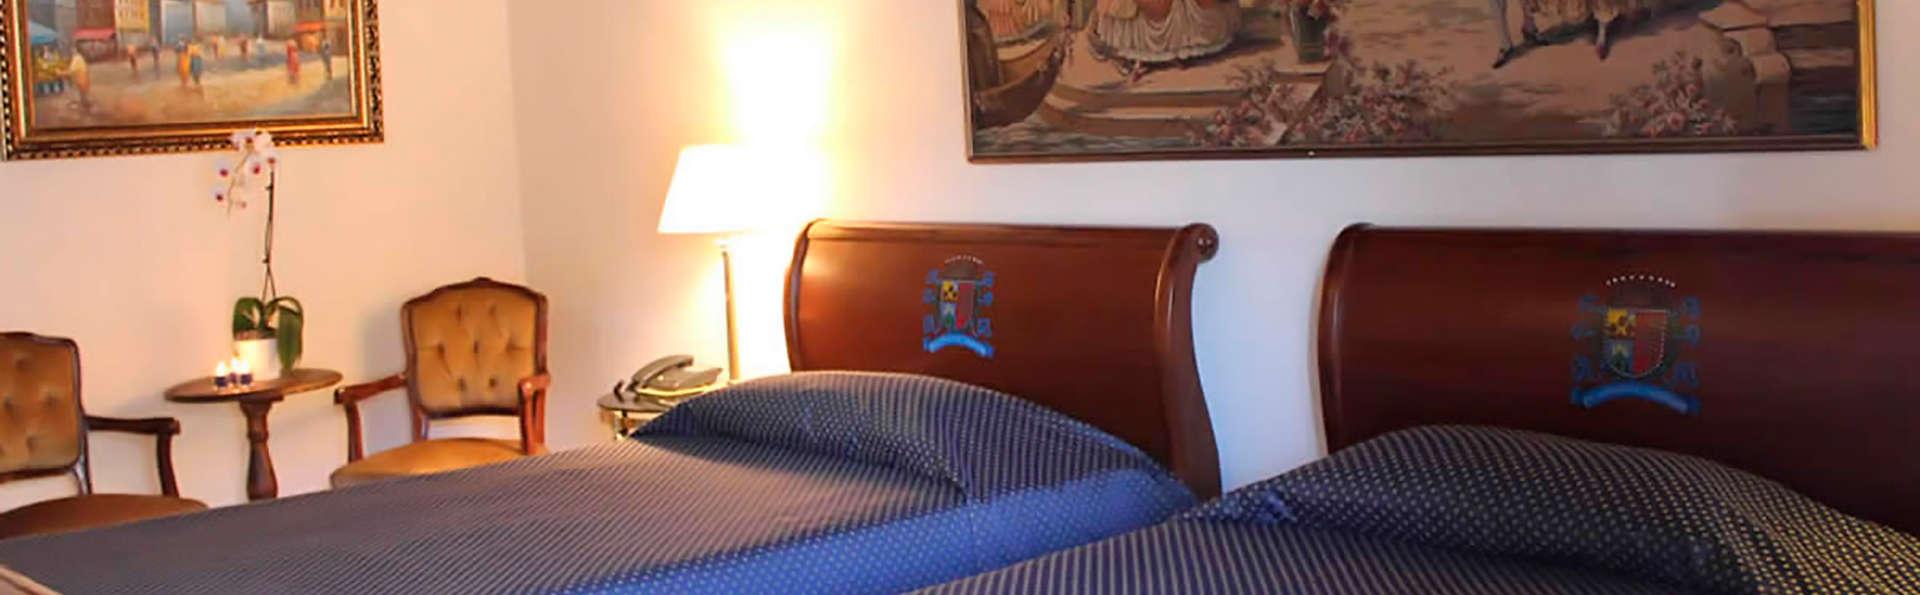 Hotel Roma Imperiale - EDIT_room2.jpg